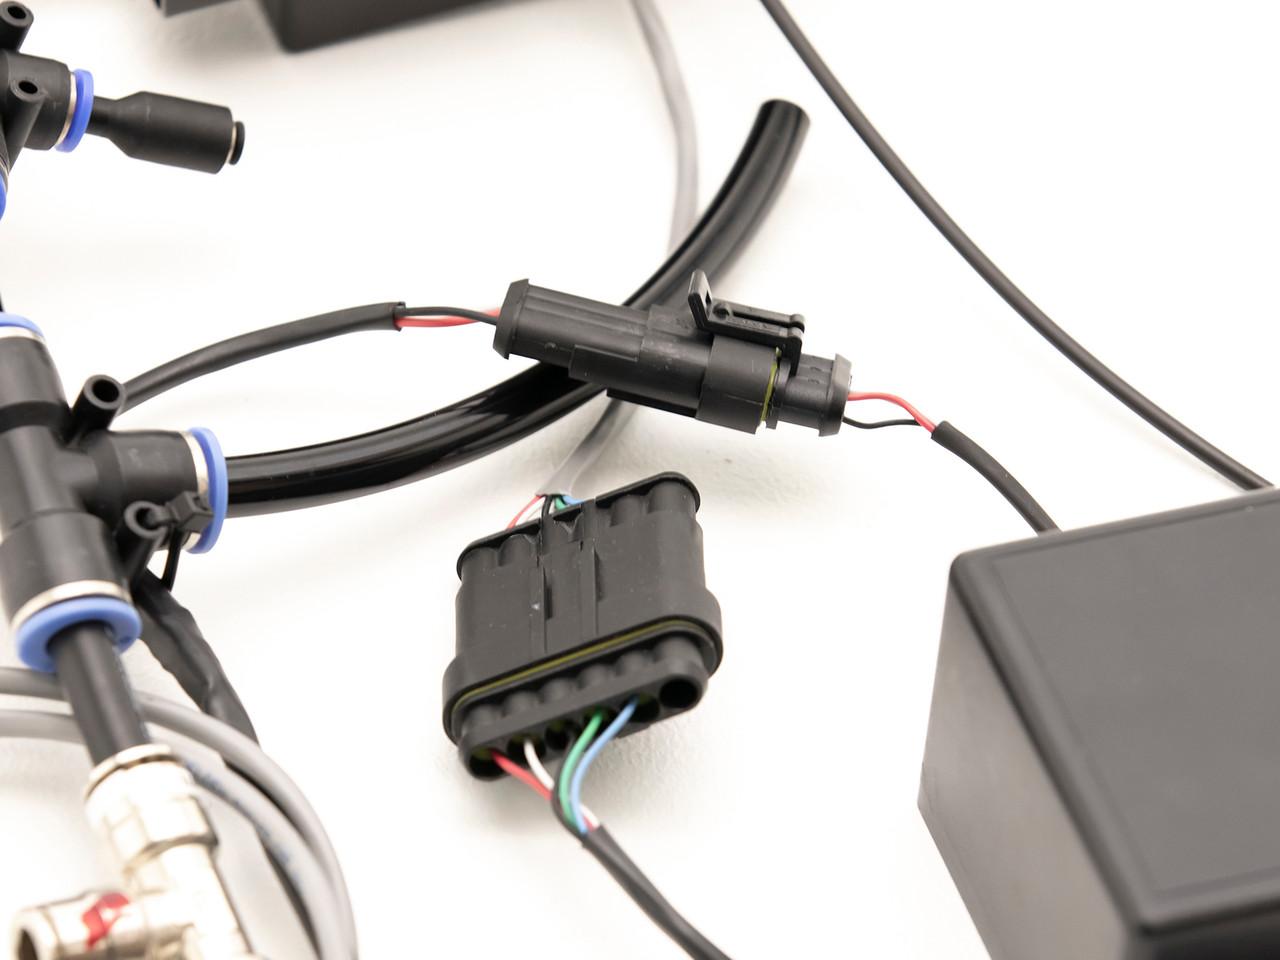 Plug and play installation